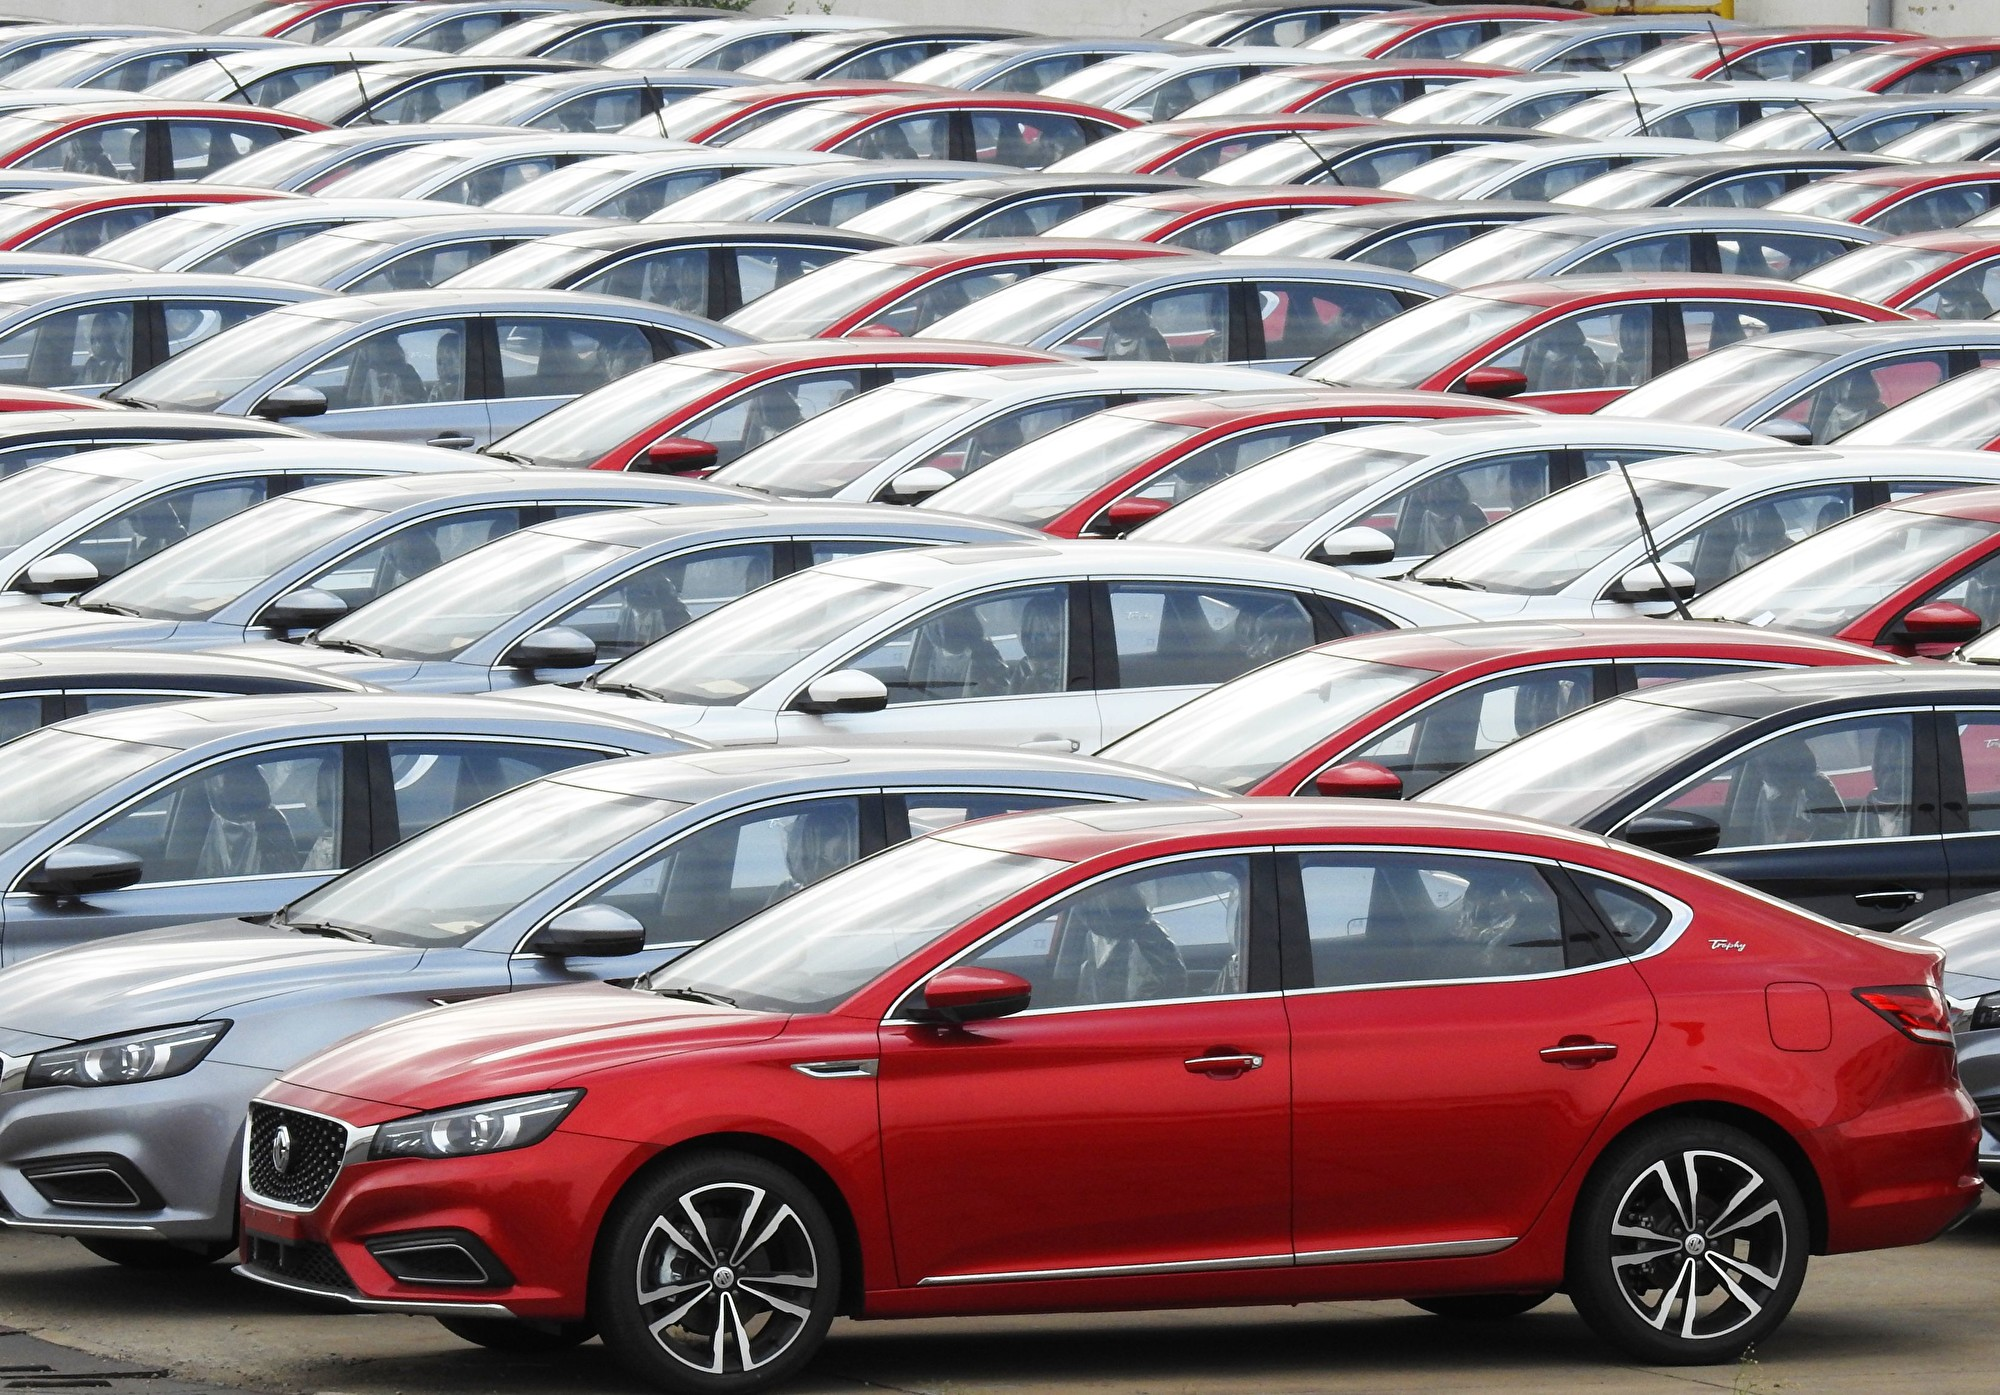 4S店半月未開張 大陸今年汽車銷量或跌8%